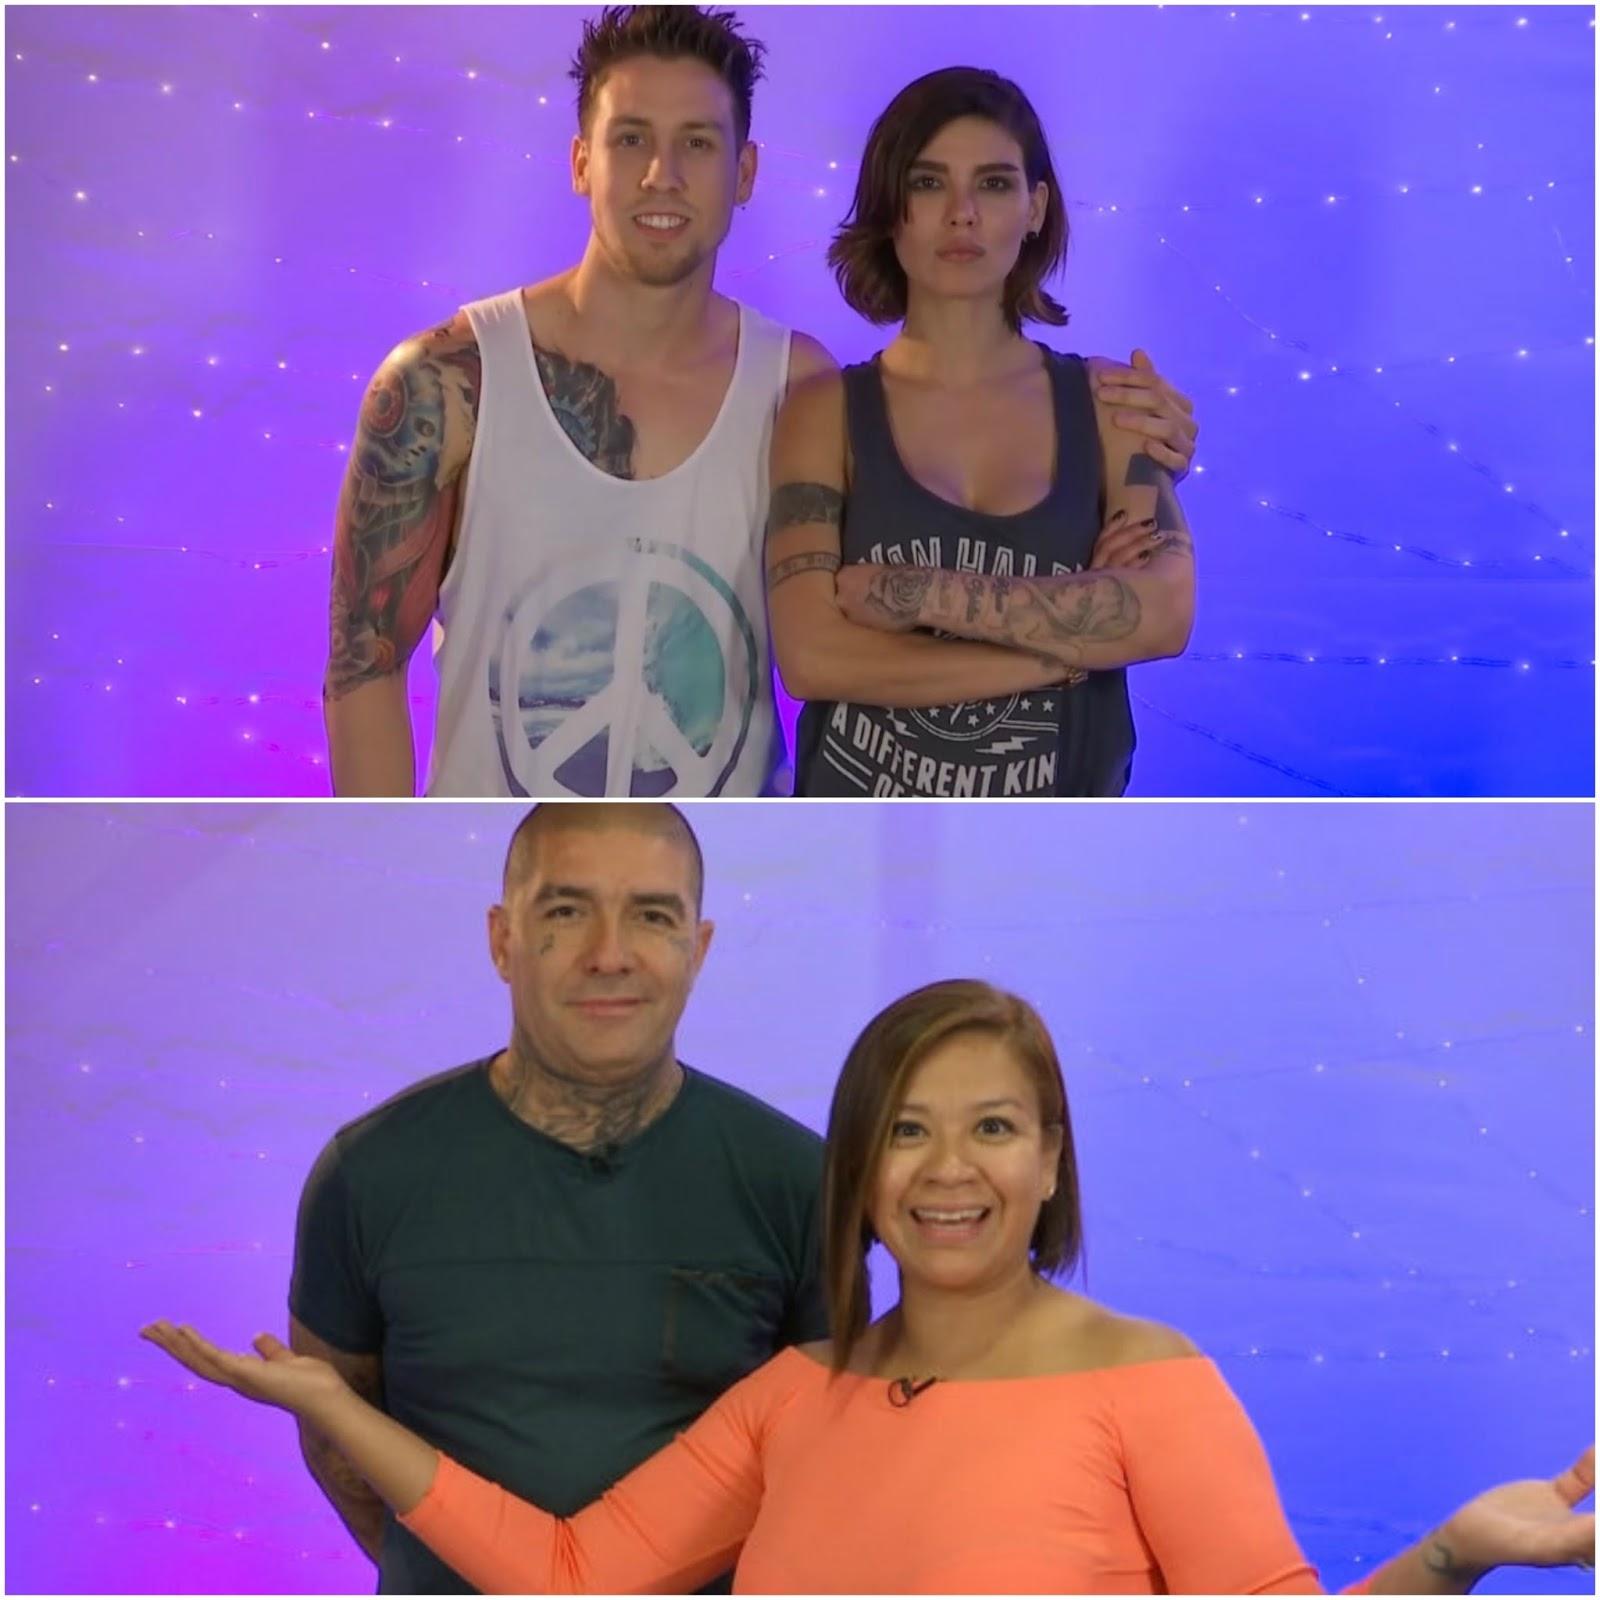 Angie Jibaja Última hora reality shows: presentamos: angie jibaja y